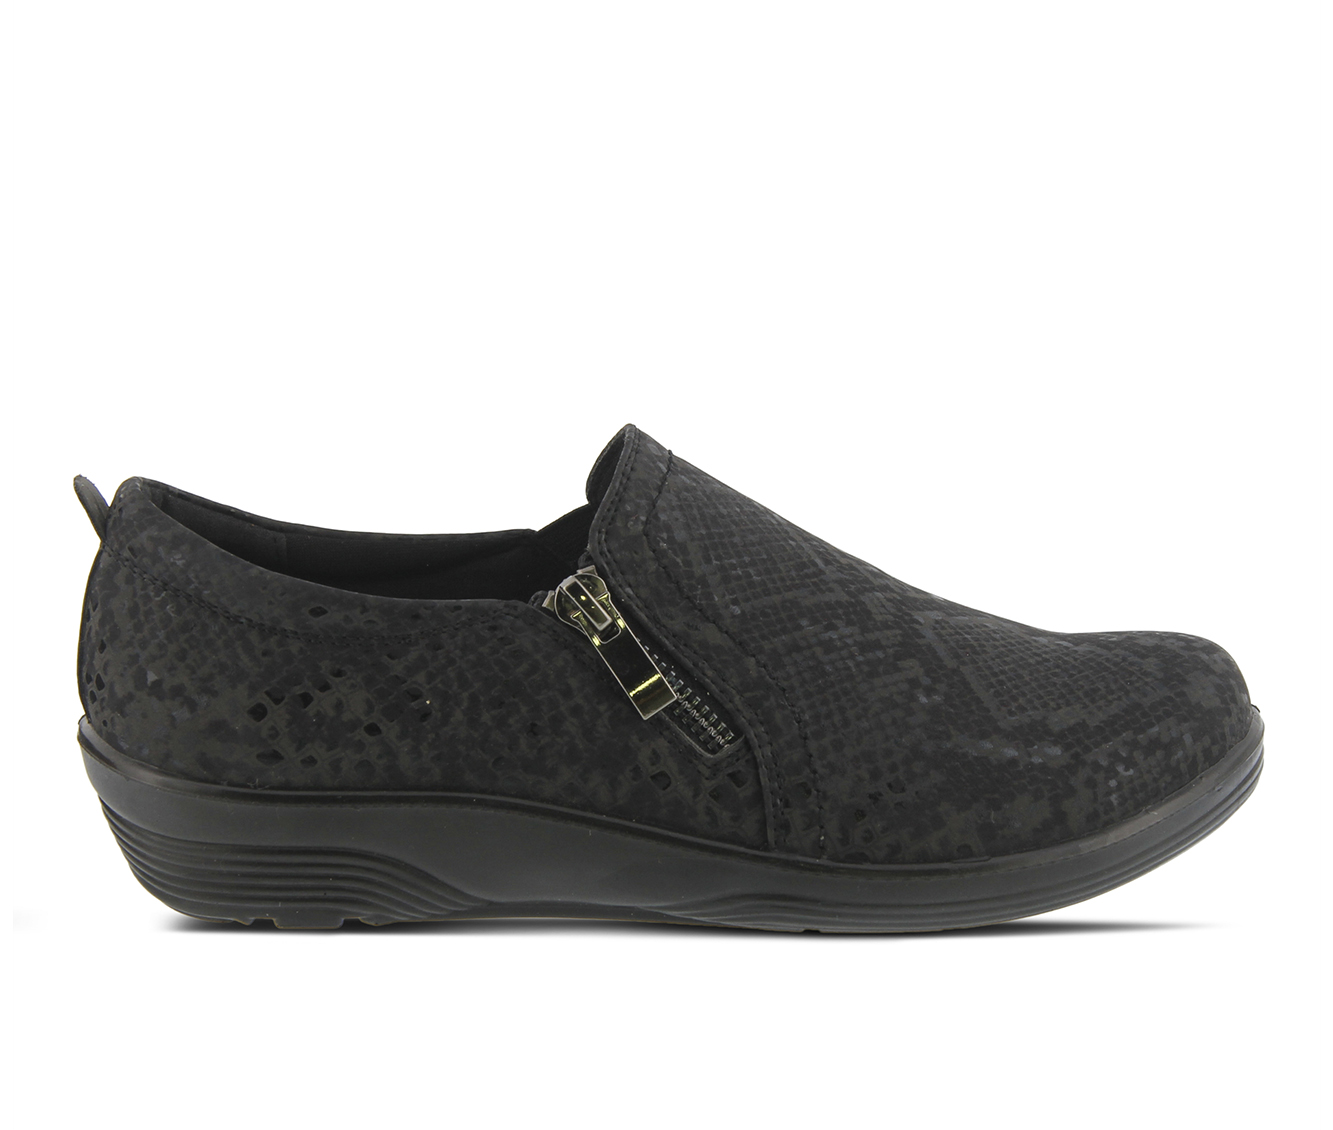 Flexus Mandiella-Rain Women's Shoe (Black Faux Leather)